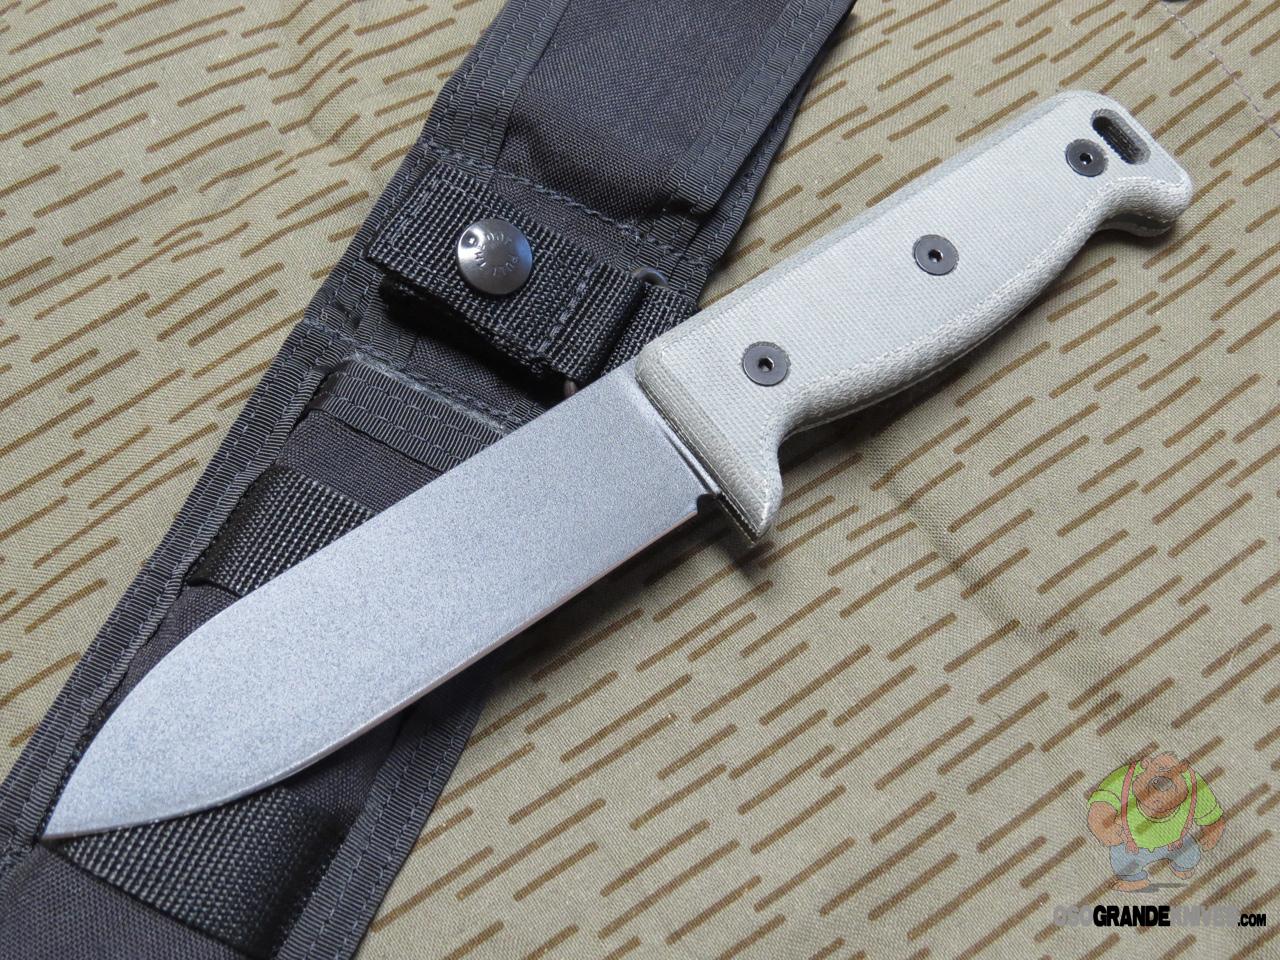 Ontario Knives Blackbird Sk 5 Noir Wilderness Survival